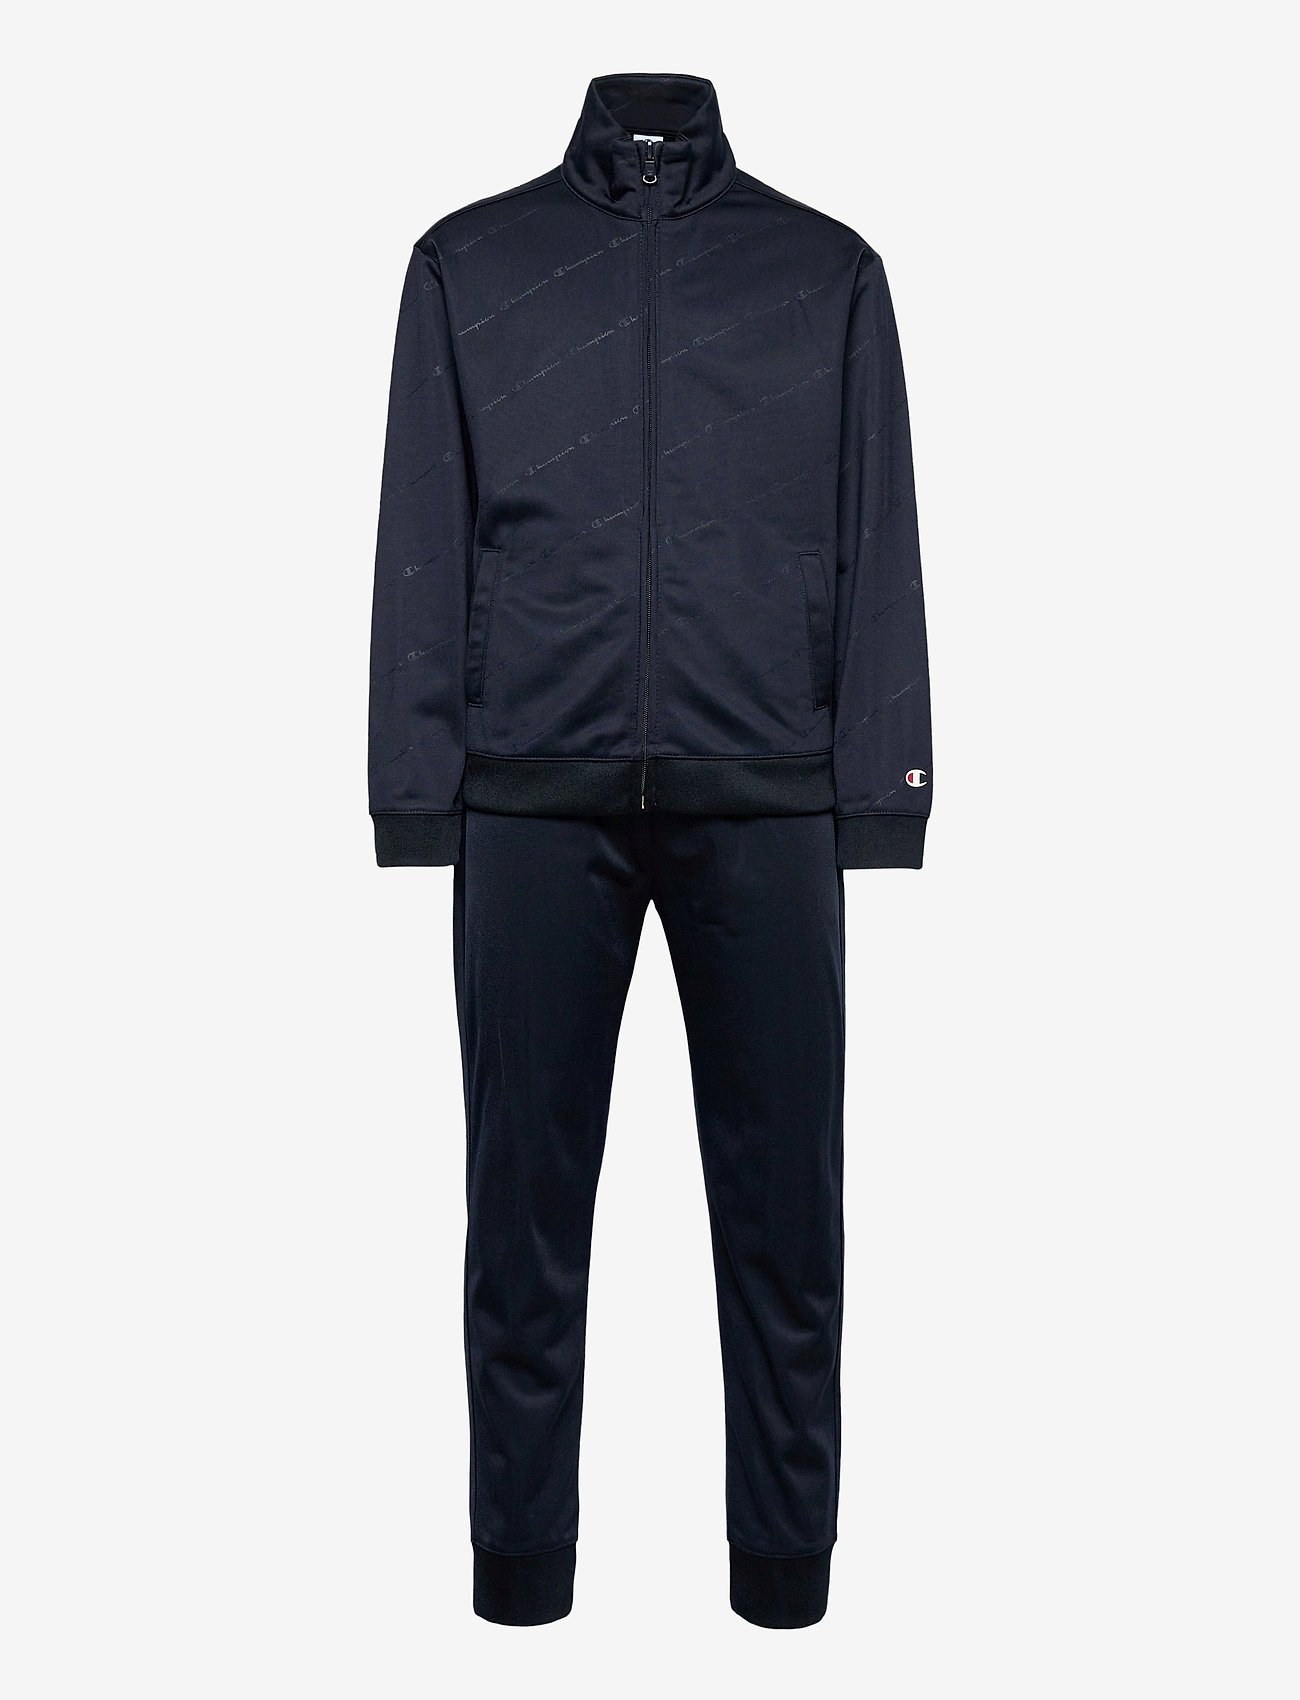 Champion - Full Zip Suit - trainingsanzug - sky captain al (nny) - 0